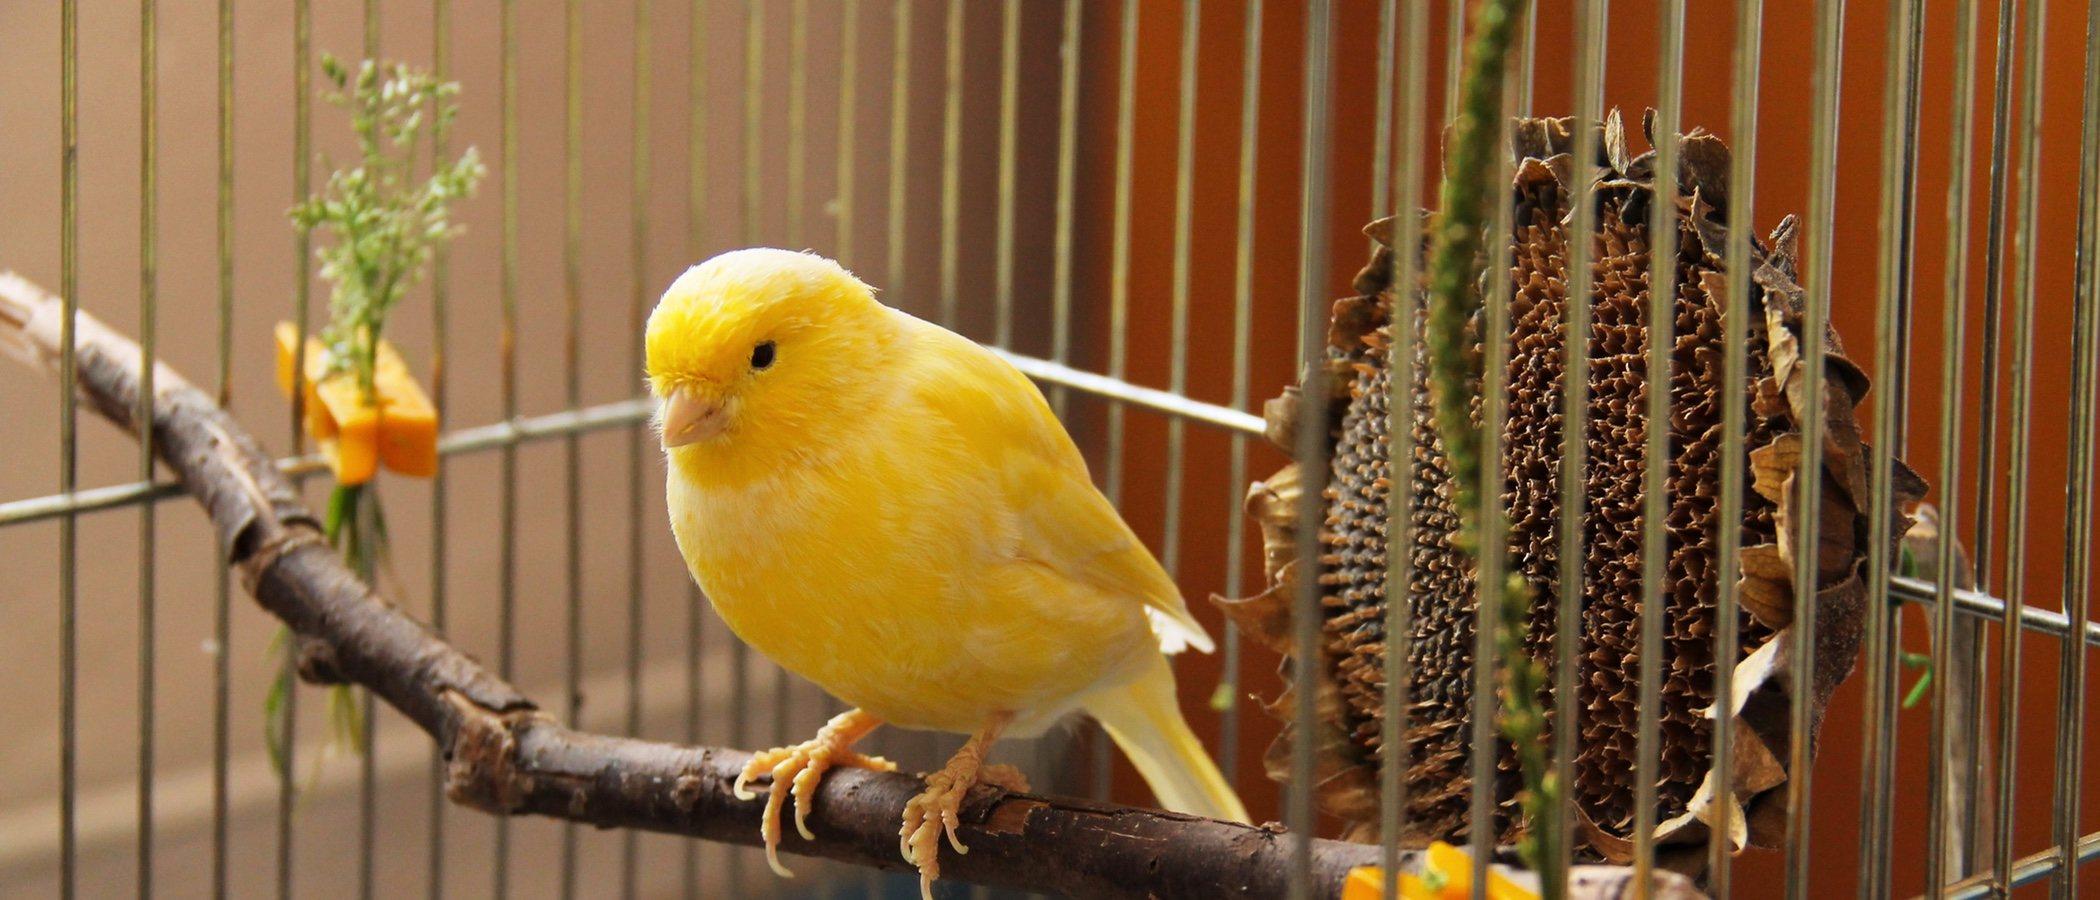 Cuánto cuesta tener un ave como mascota